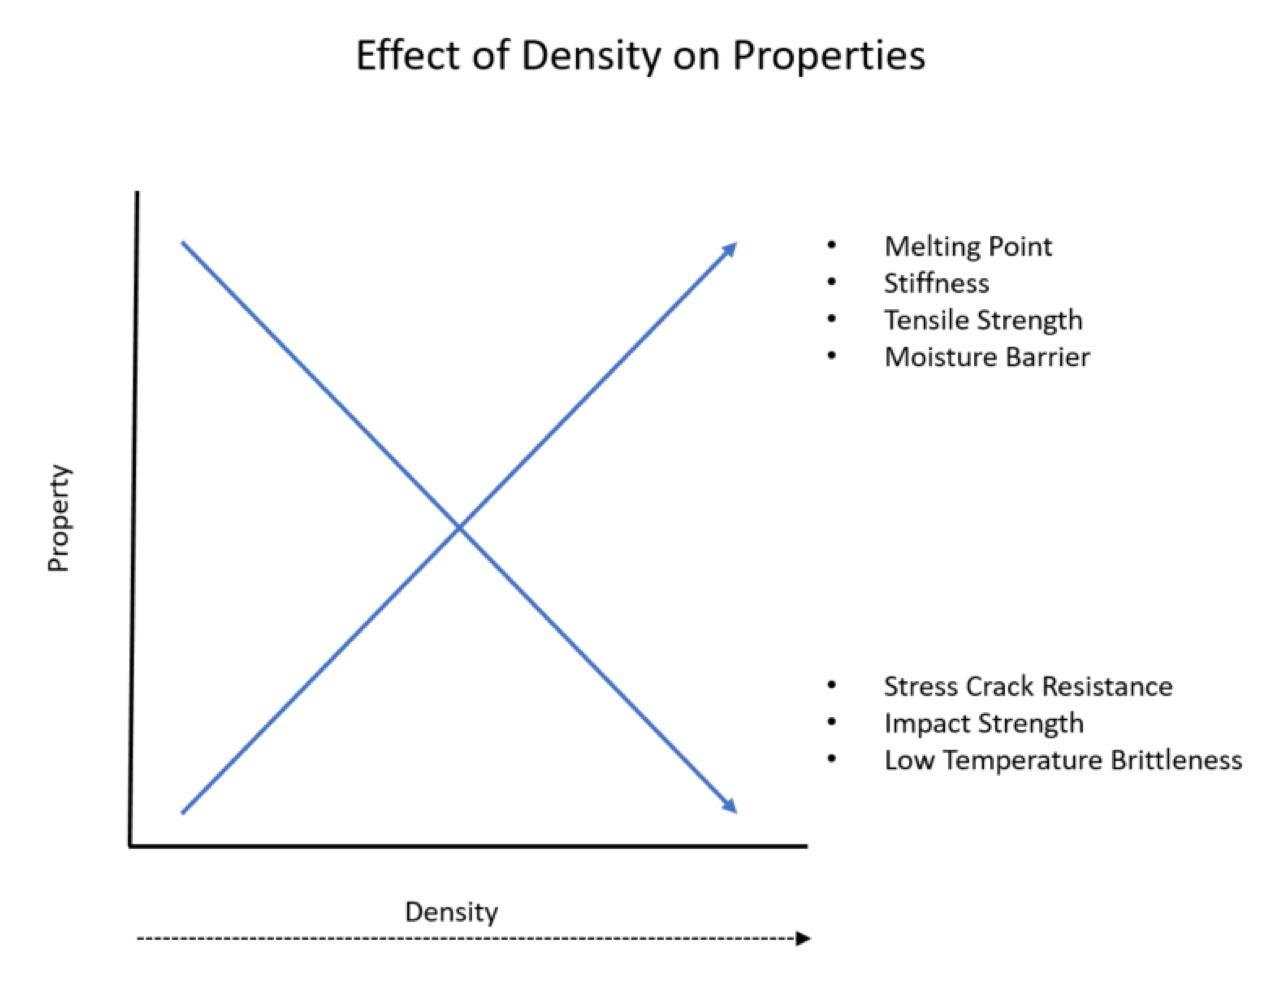 Effect of Density on Properties